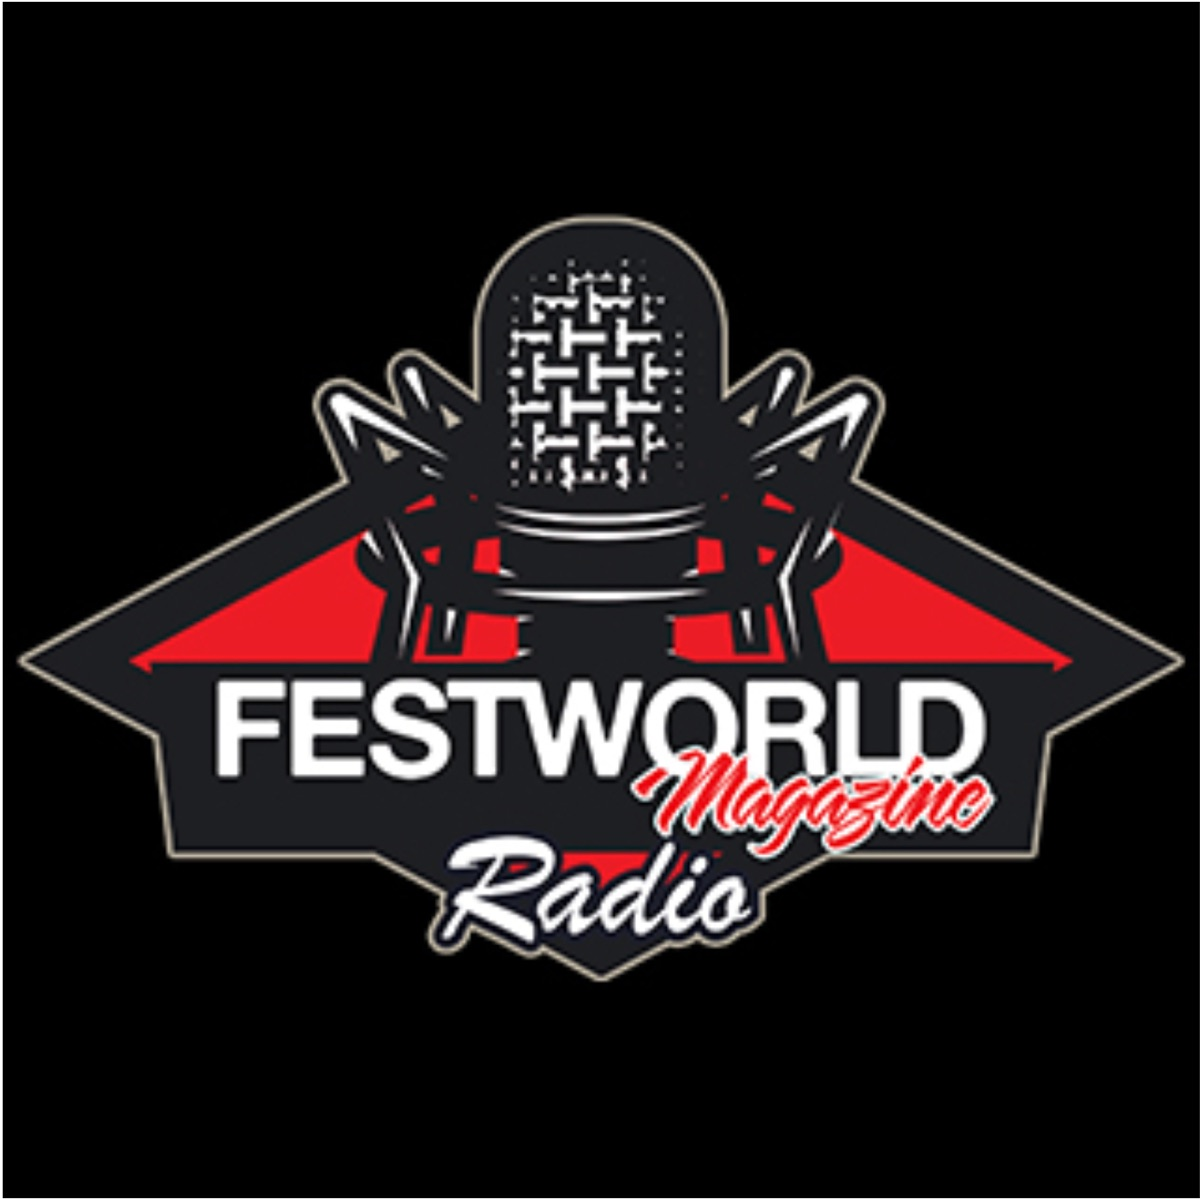 FestWorld Magazine Radio